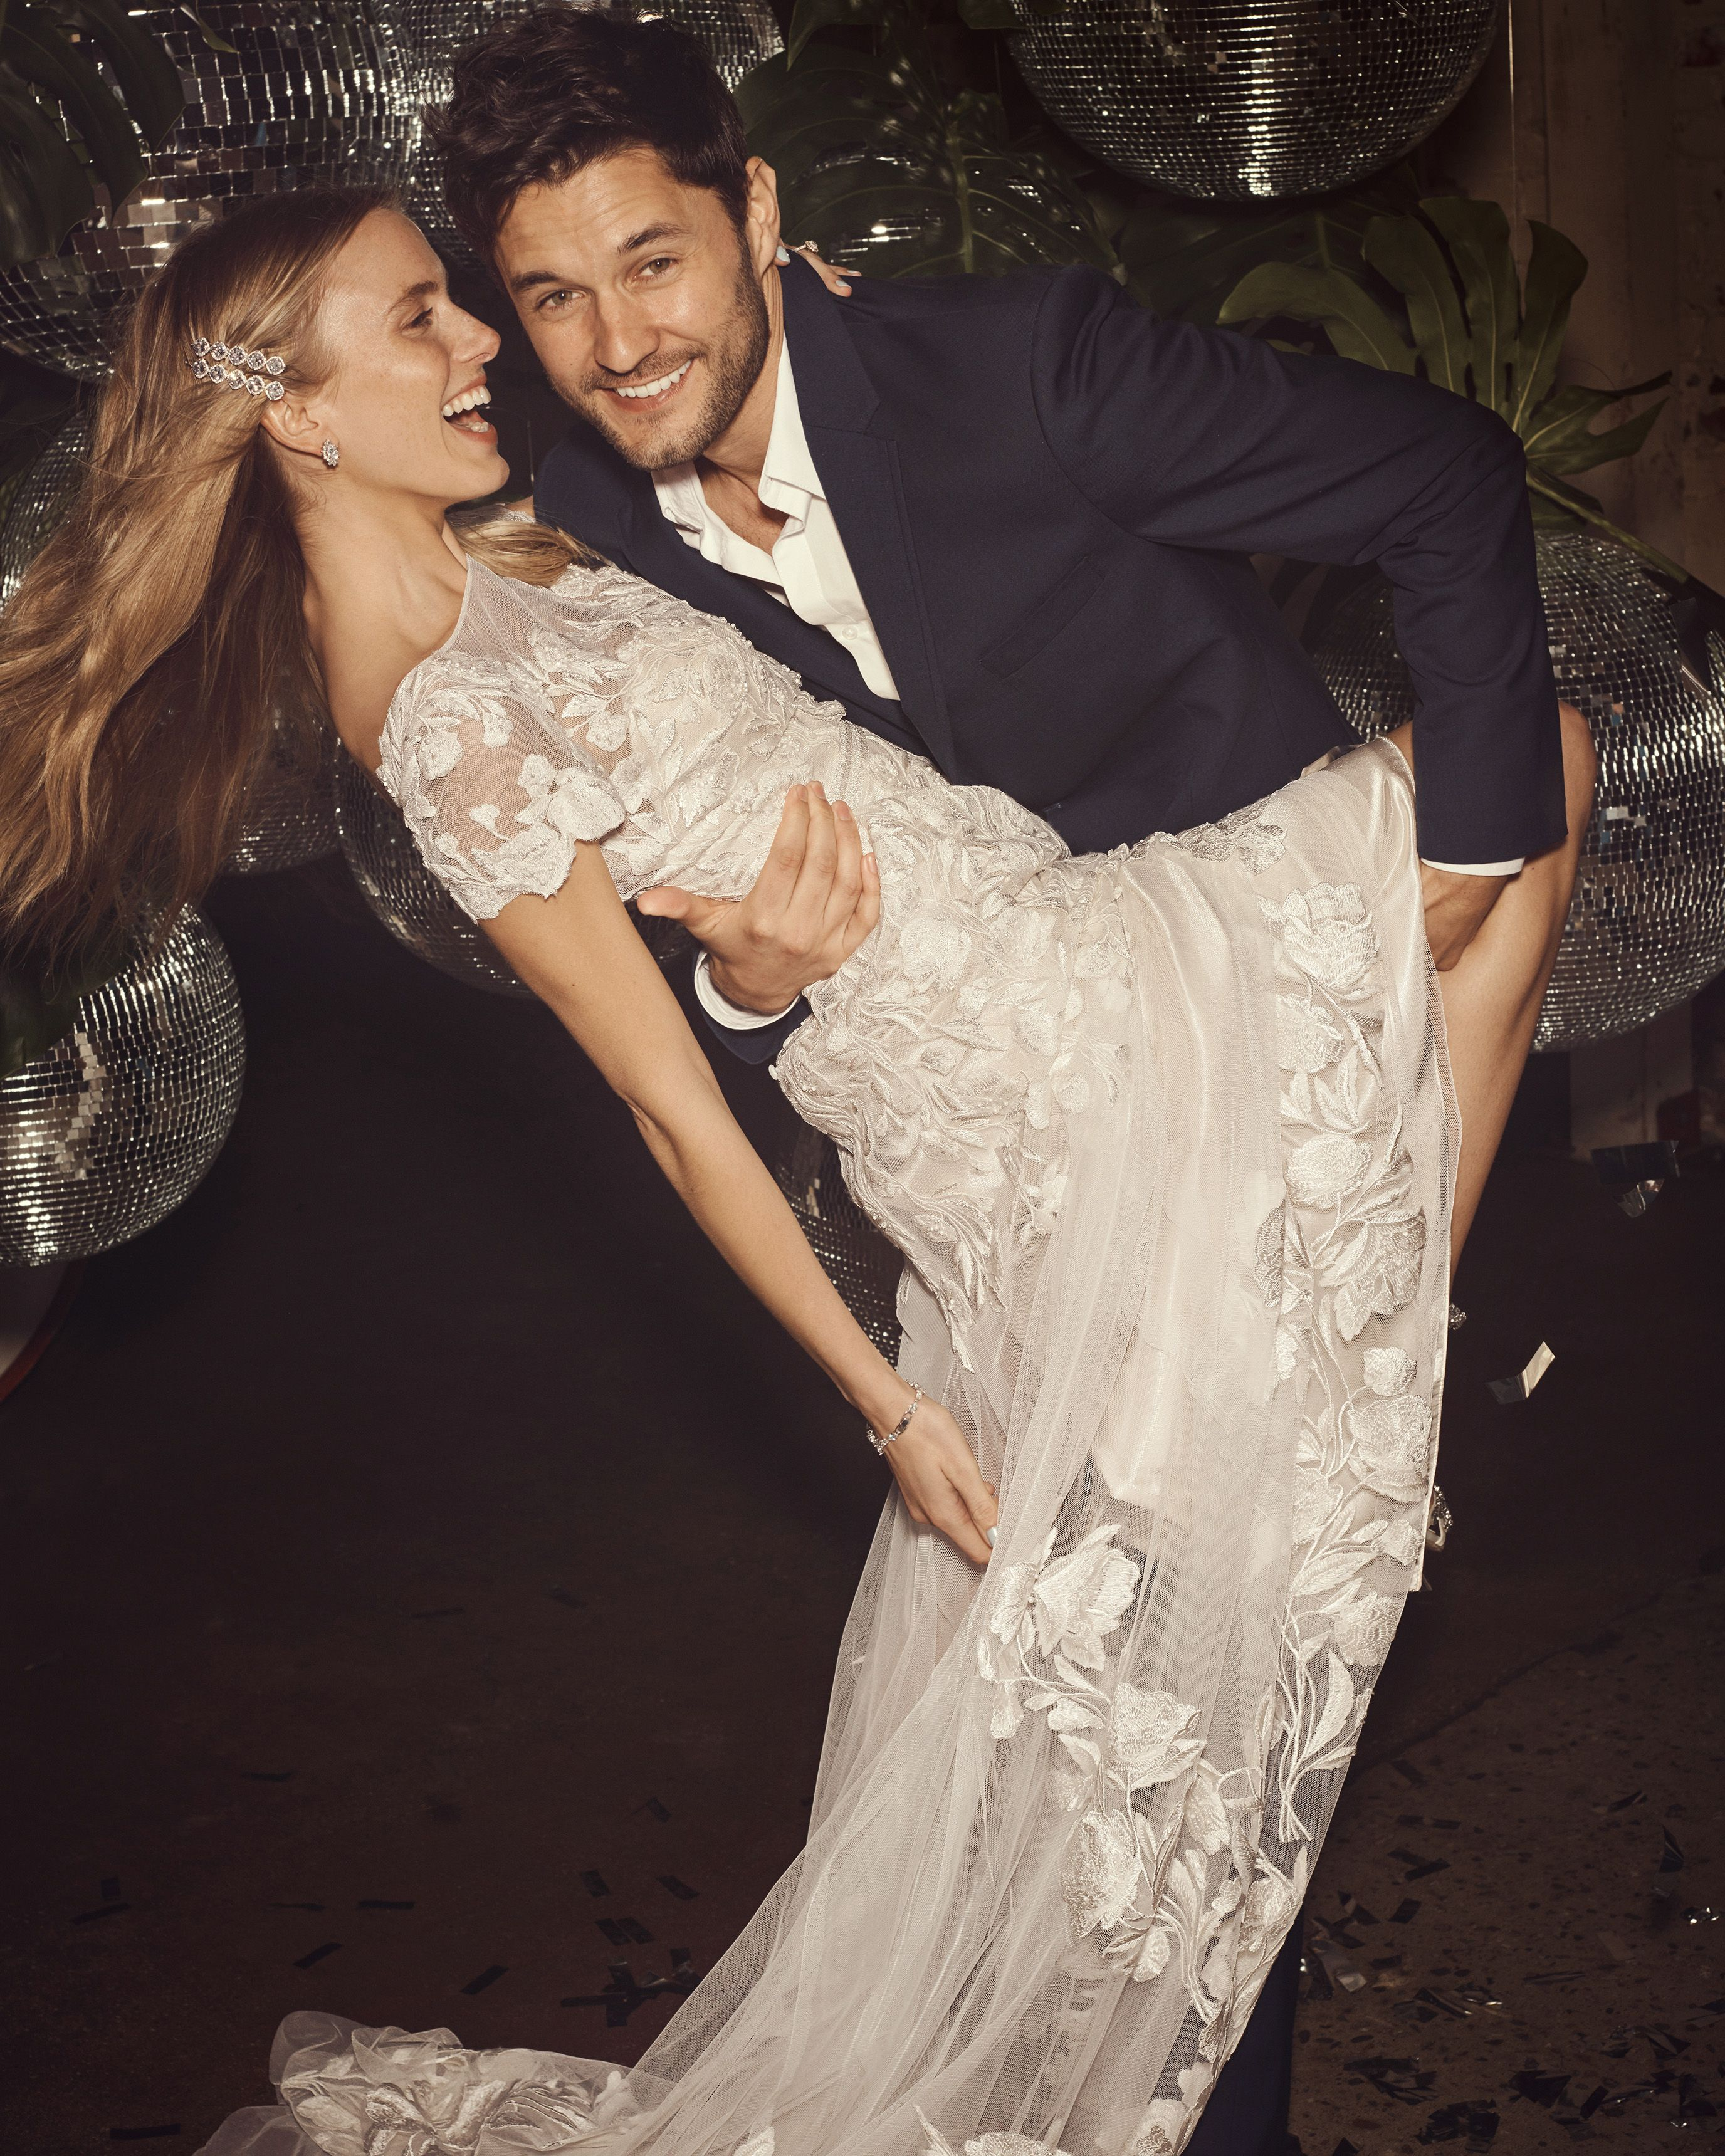 Embroidered Illusion Cap Sleeve Wedding Dress David S Bridal Wedding Cap Sleeves Davids Bridal Wedding Dresses Wedding Dress Cap Sleeves [ 3440 x 2752 Pixel ]